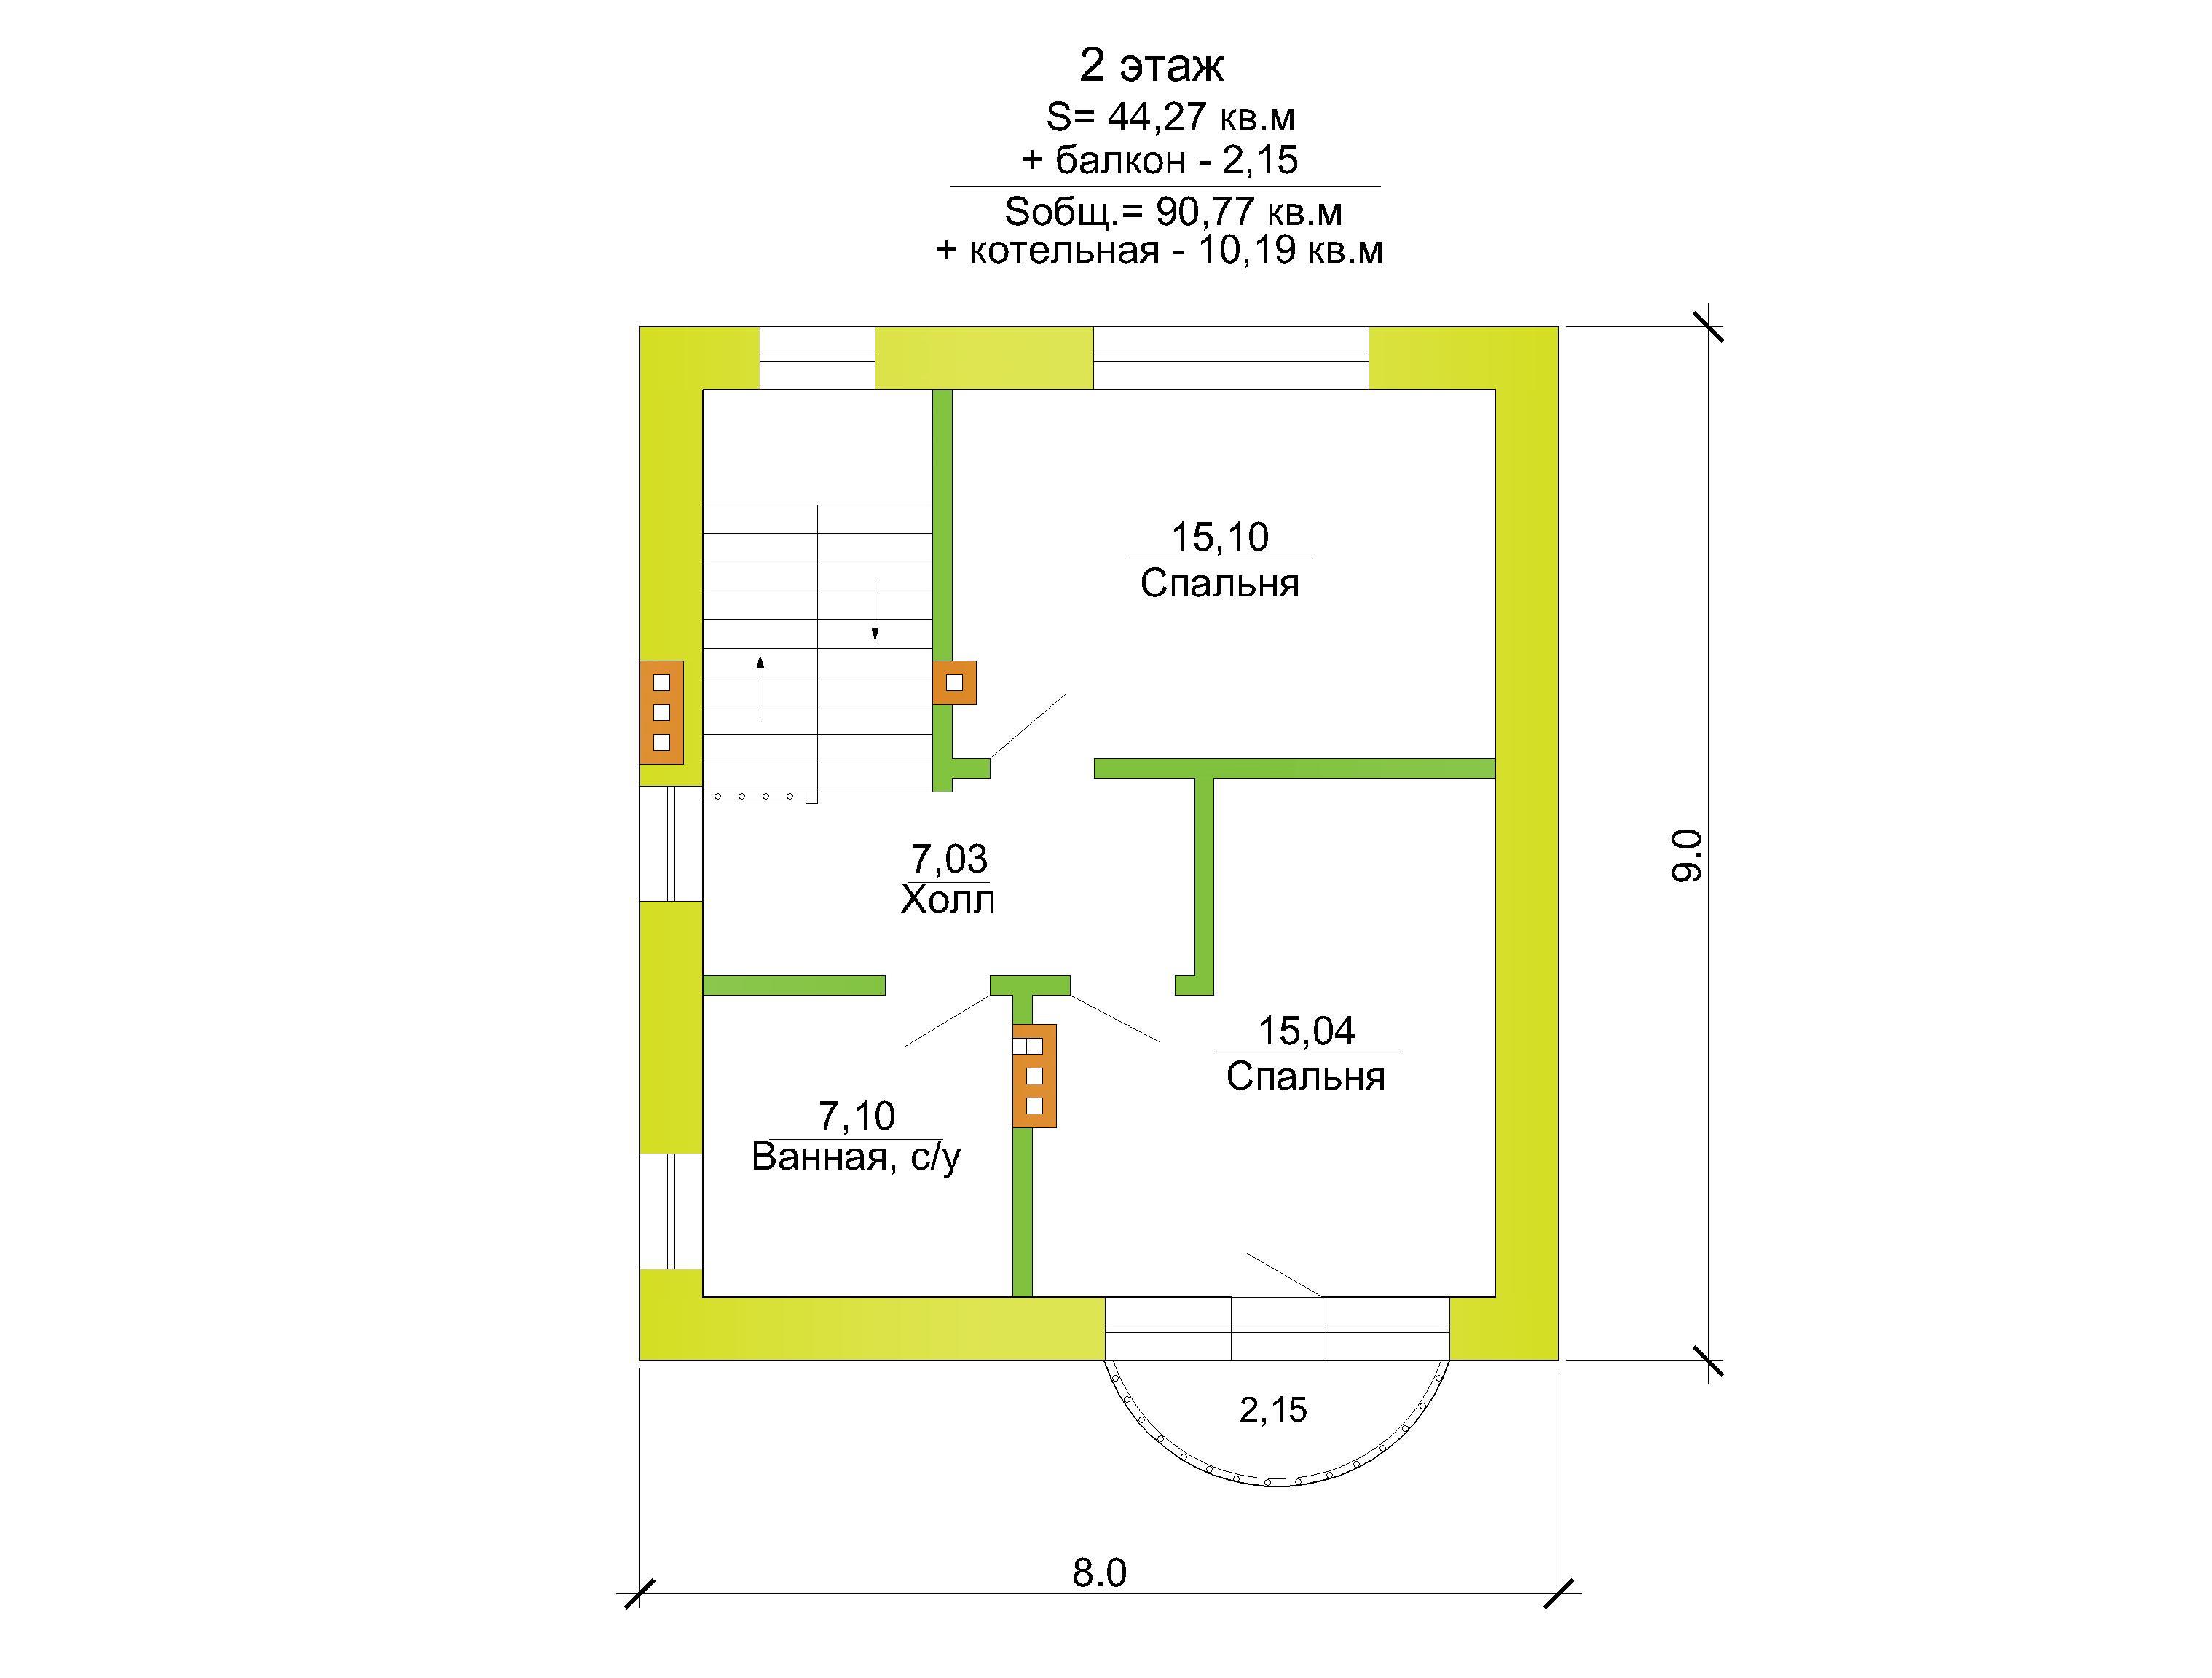 Готовый проект коттеджа 90 кв. м / Артикул DK-49 план